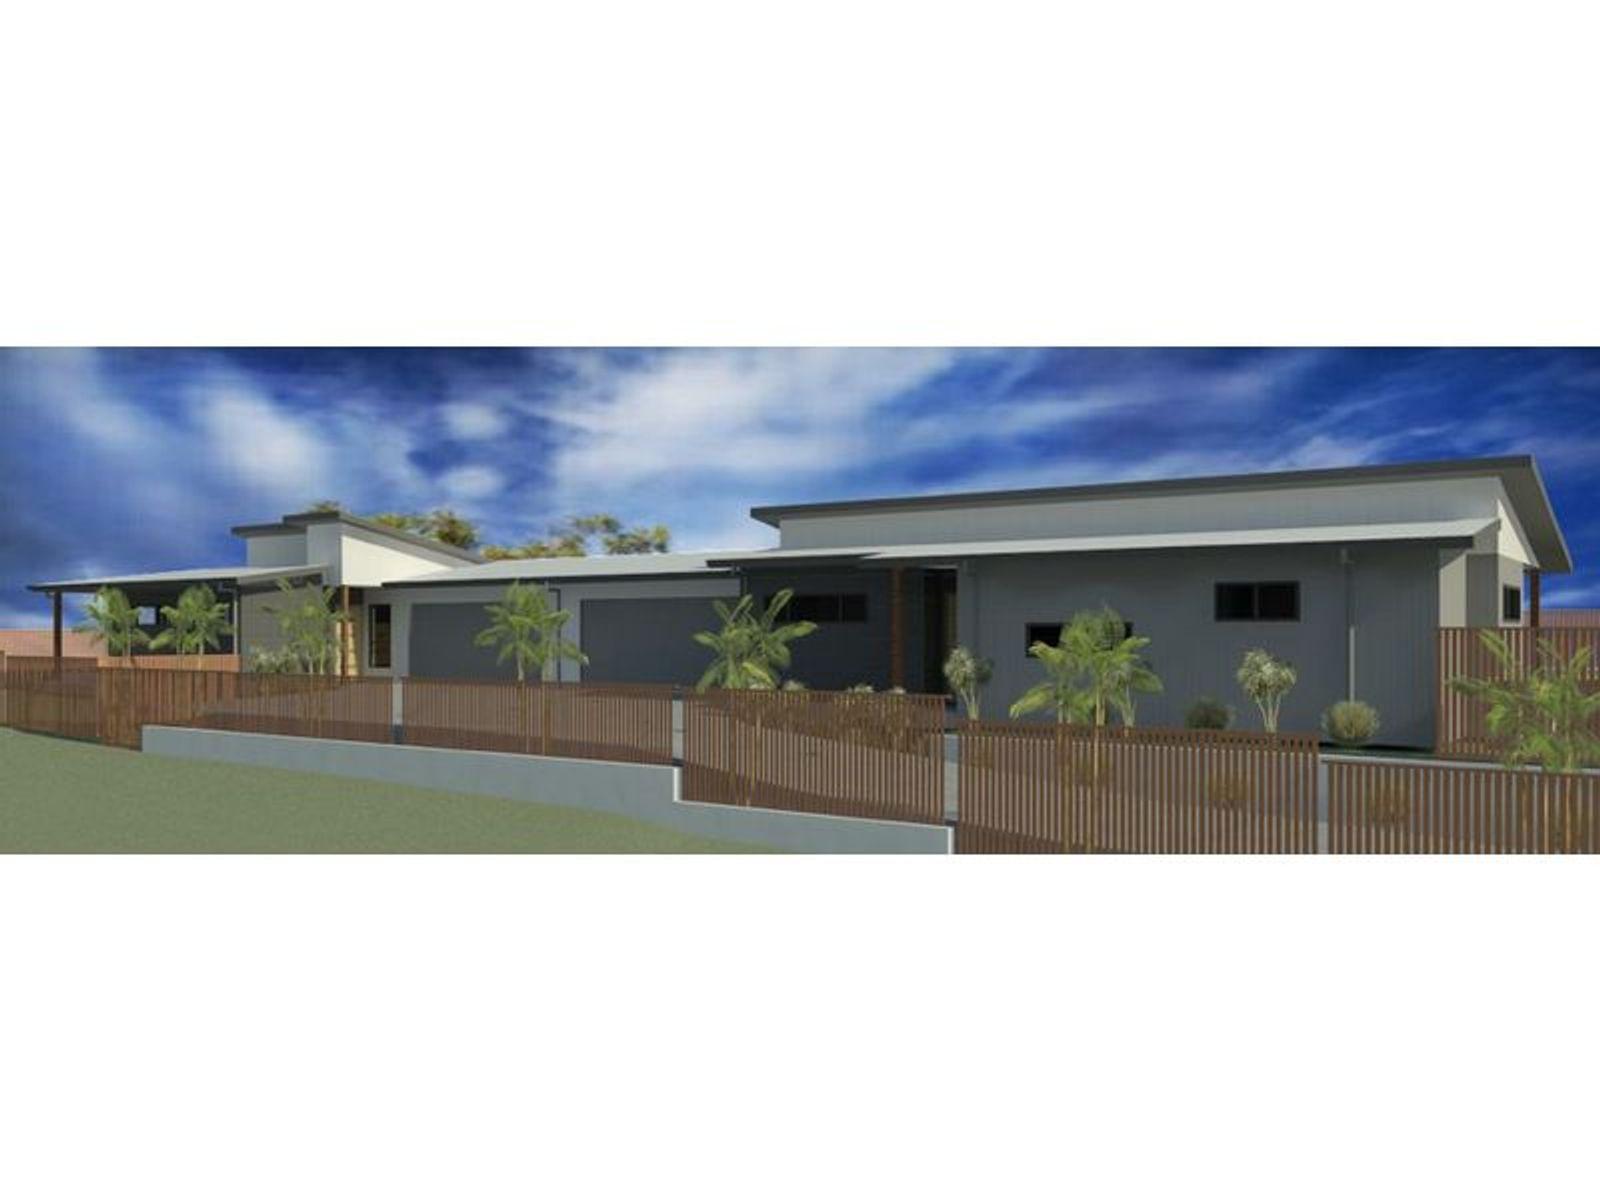 2/54 Elizabeth Street, Nambour, QLD 4560